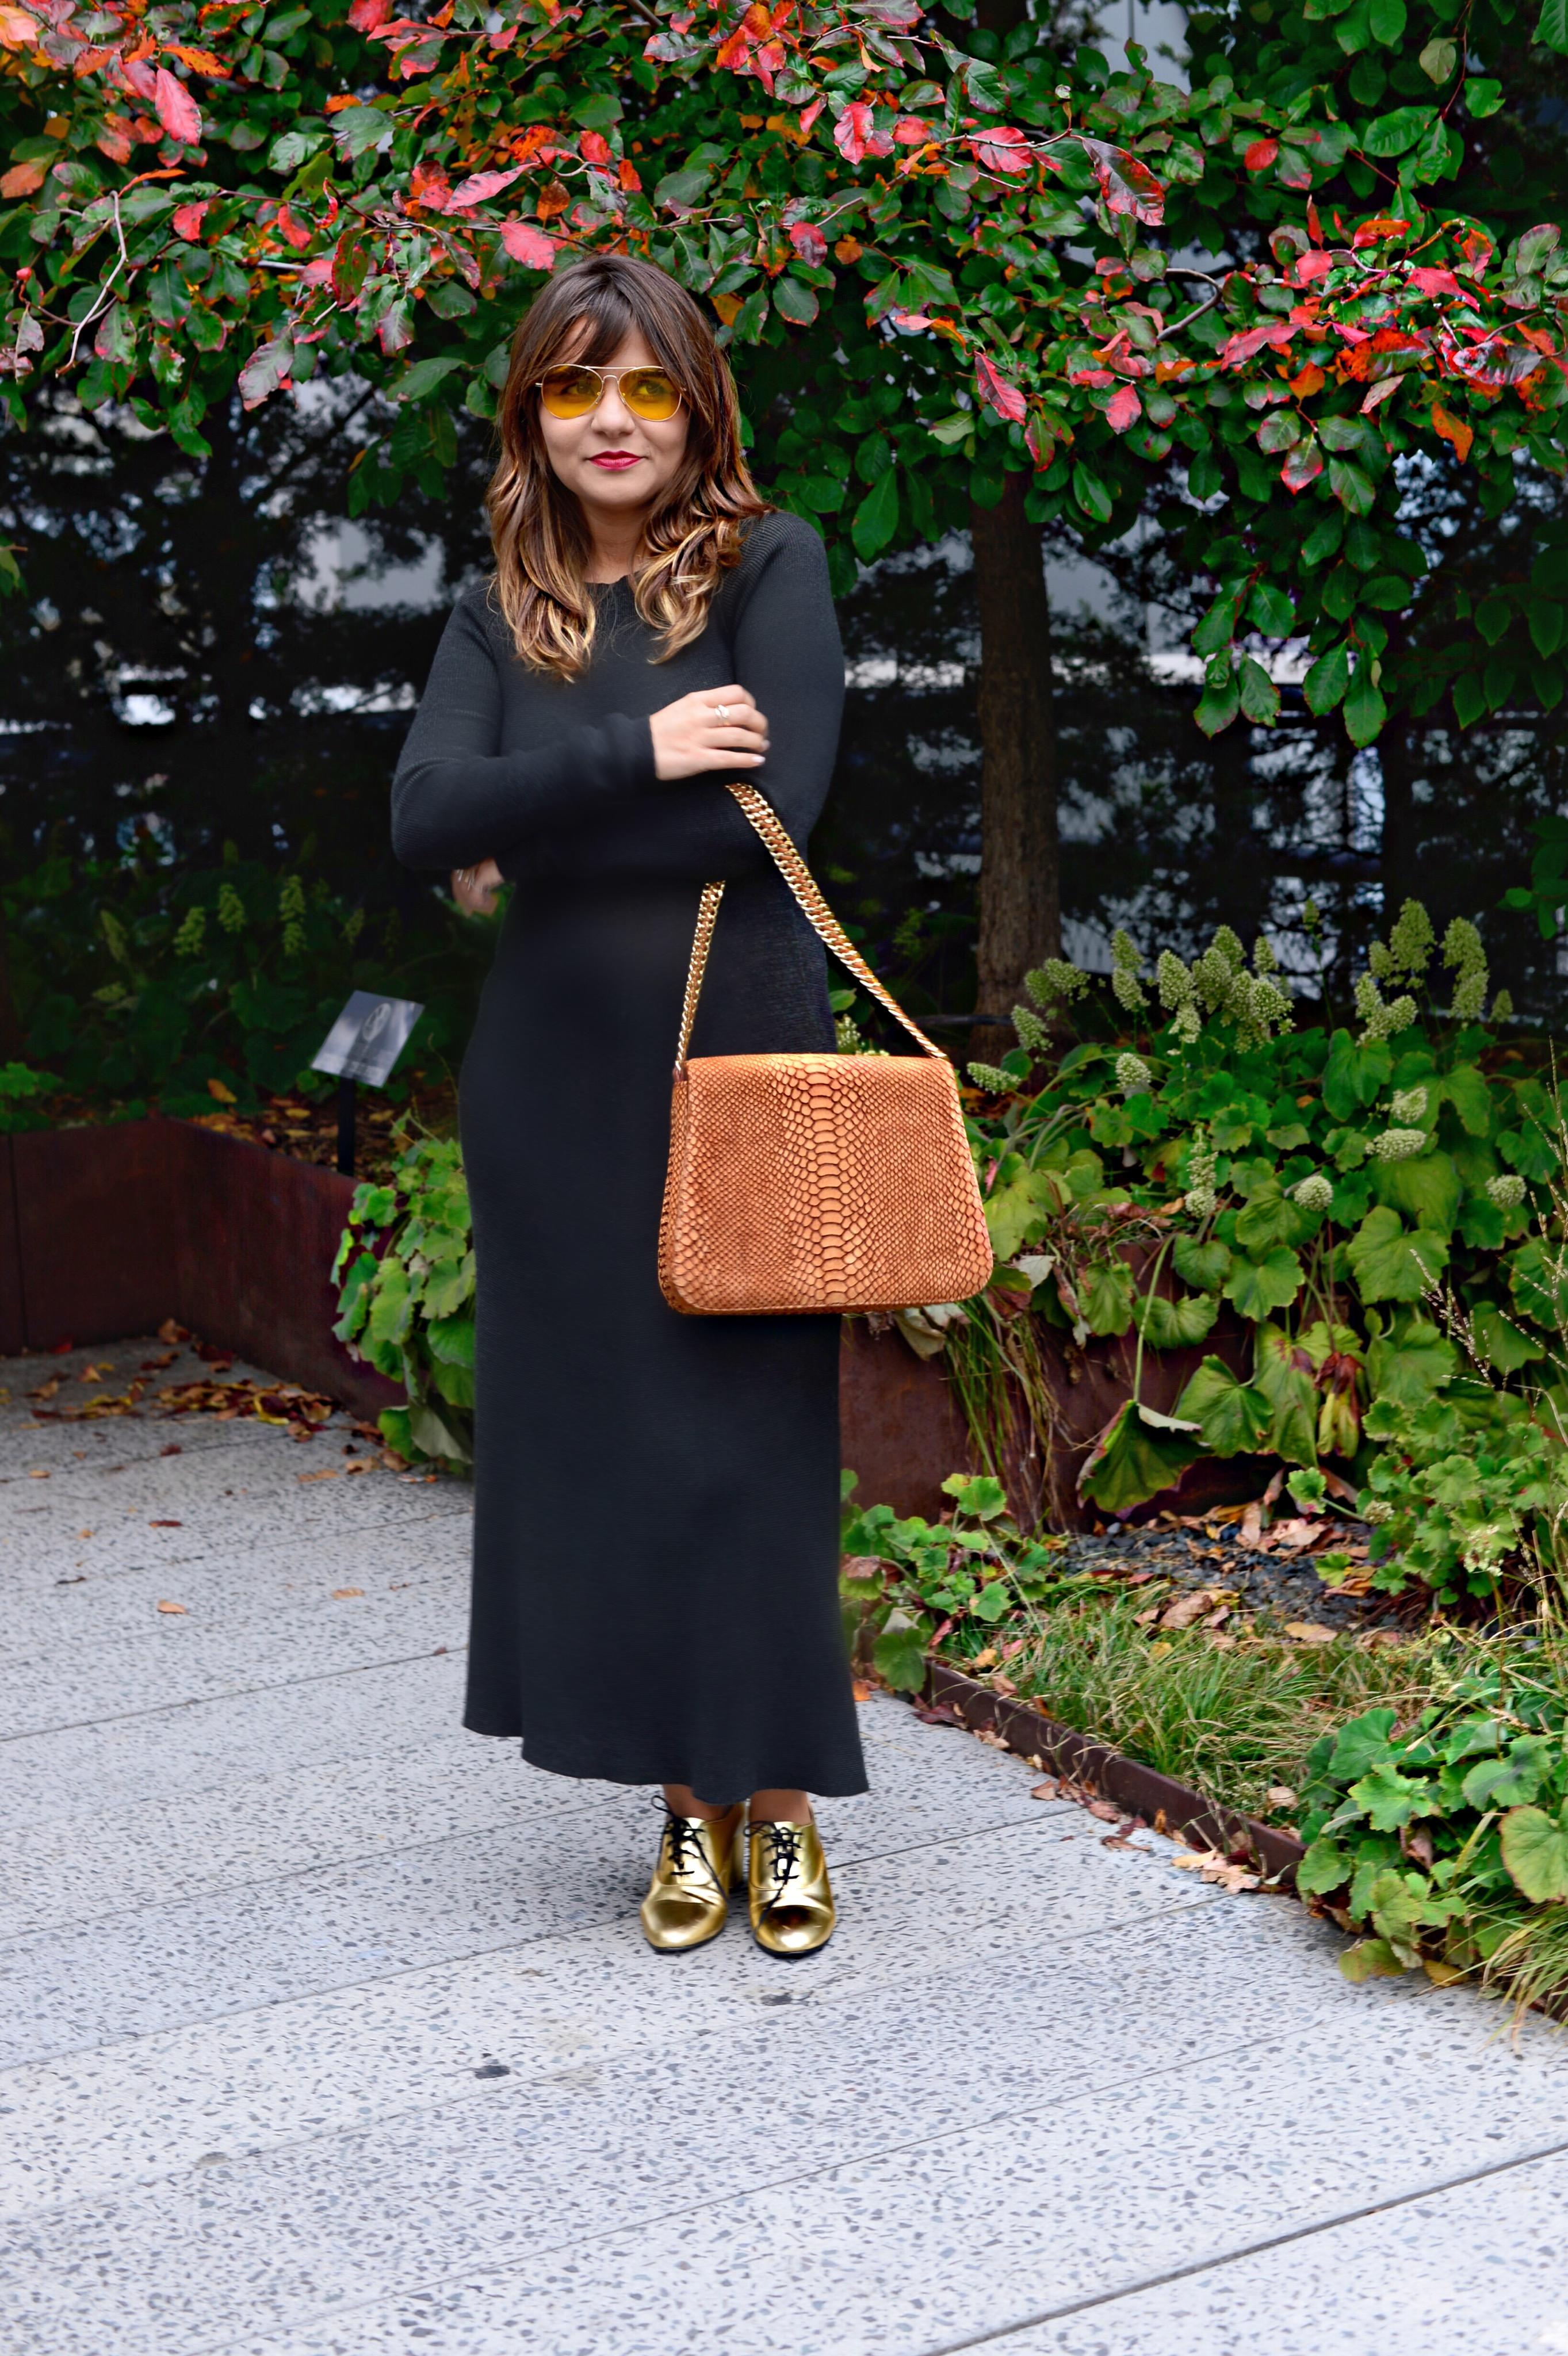 jersey-dress-gold-shoes-alley-girl-betul-yildiz-new-york-fashion-blogger-5